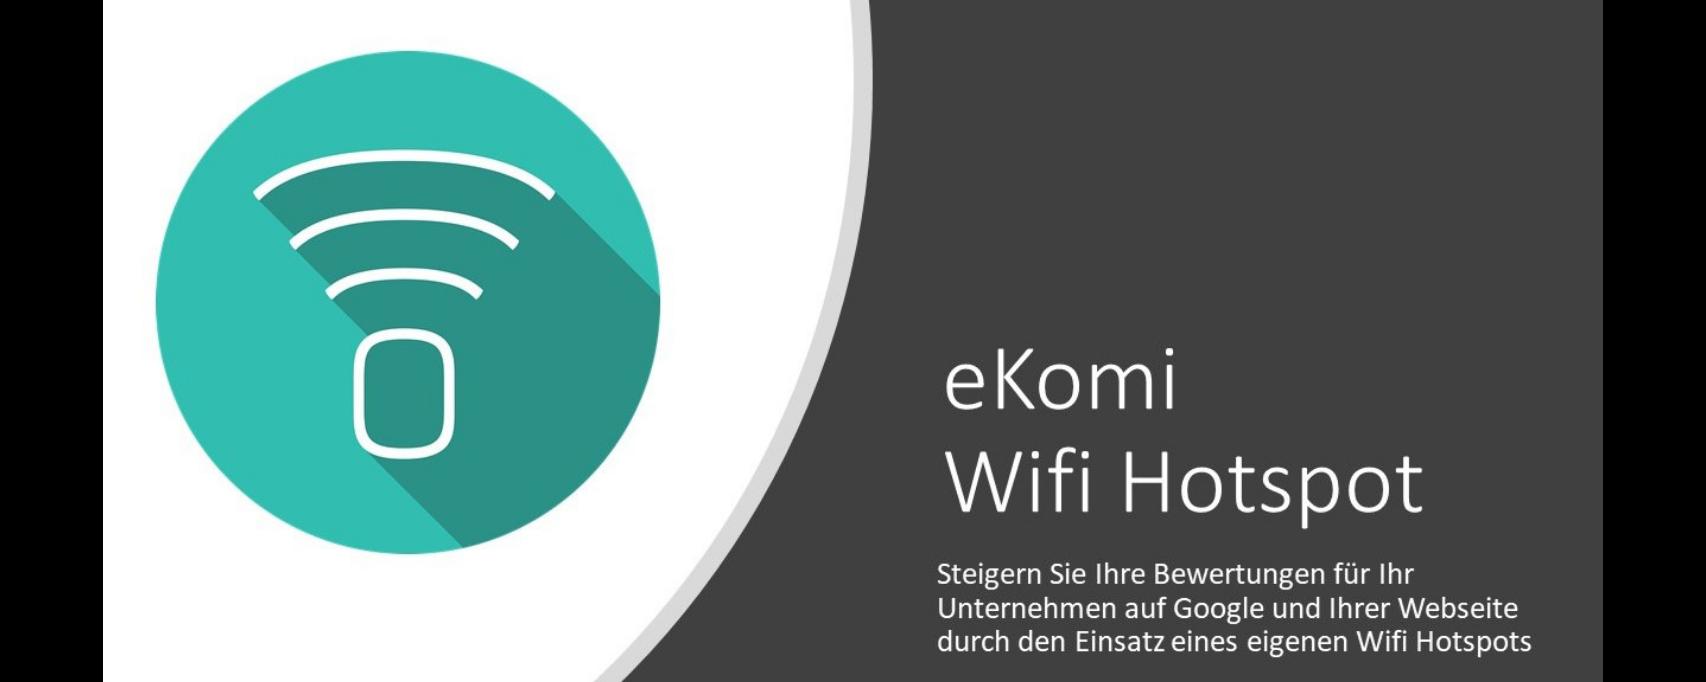 ekomi_wifi_banner-1568280763.png